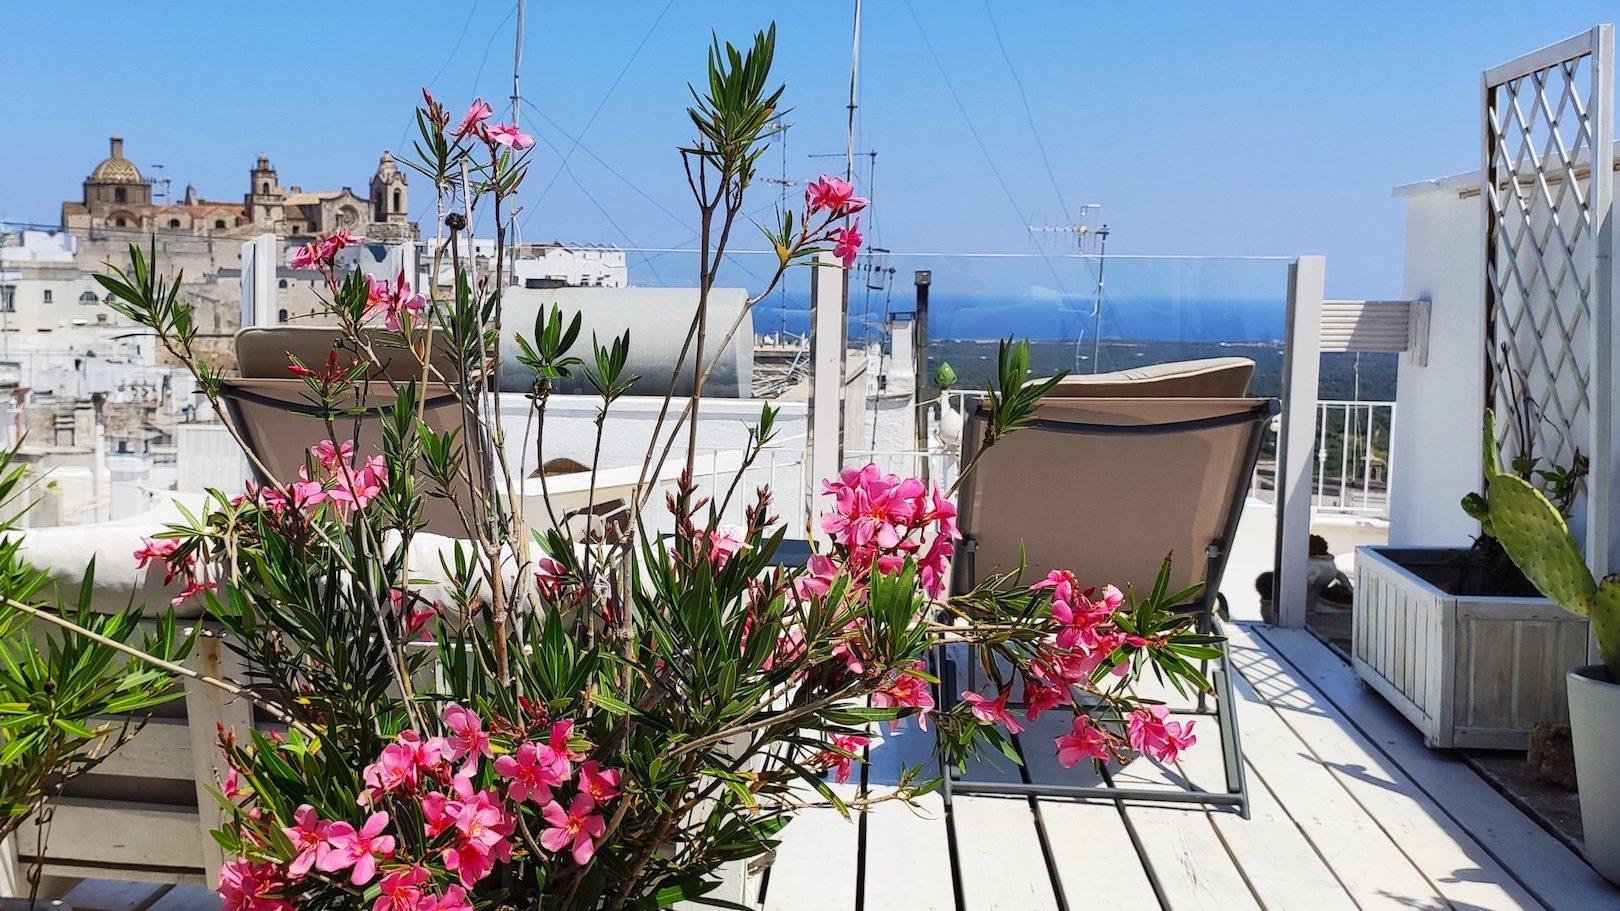 view of Ostuni historical centre and the blue Adriatic sea at Casa dei Fiori holiday vacation rental home in Puglia